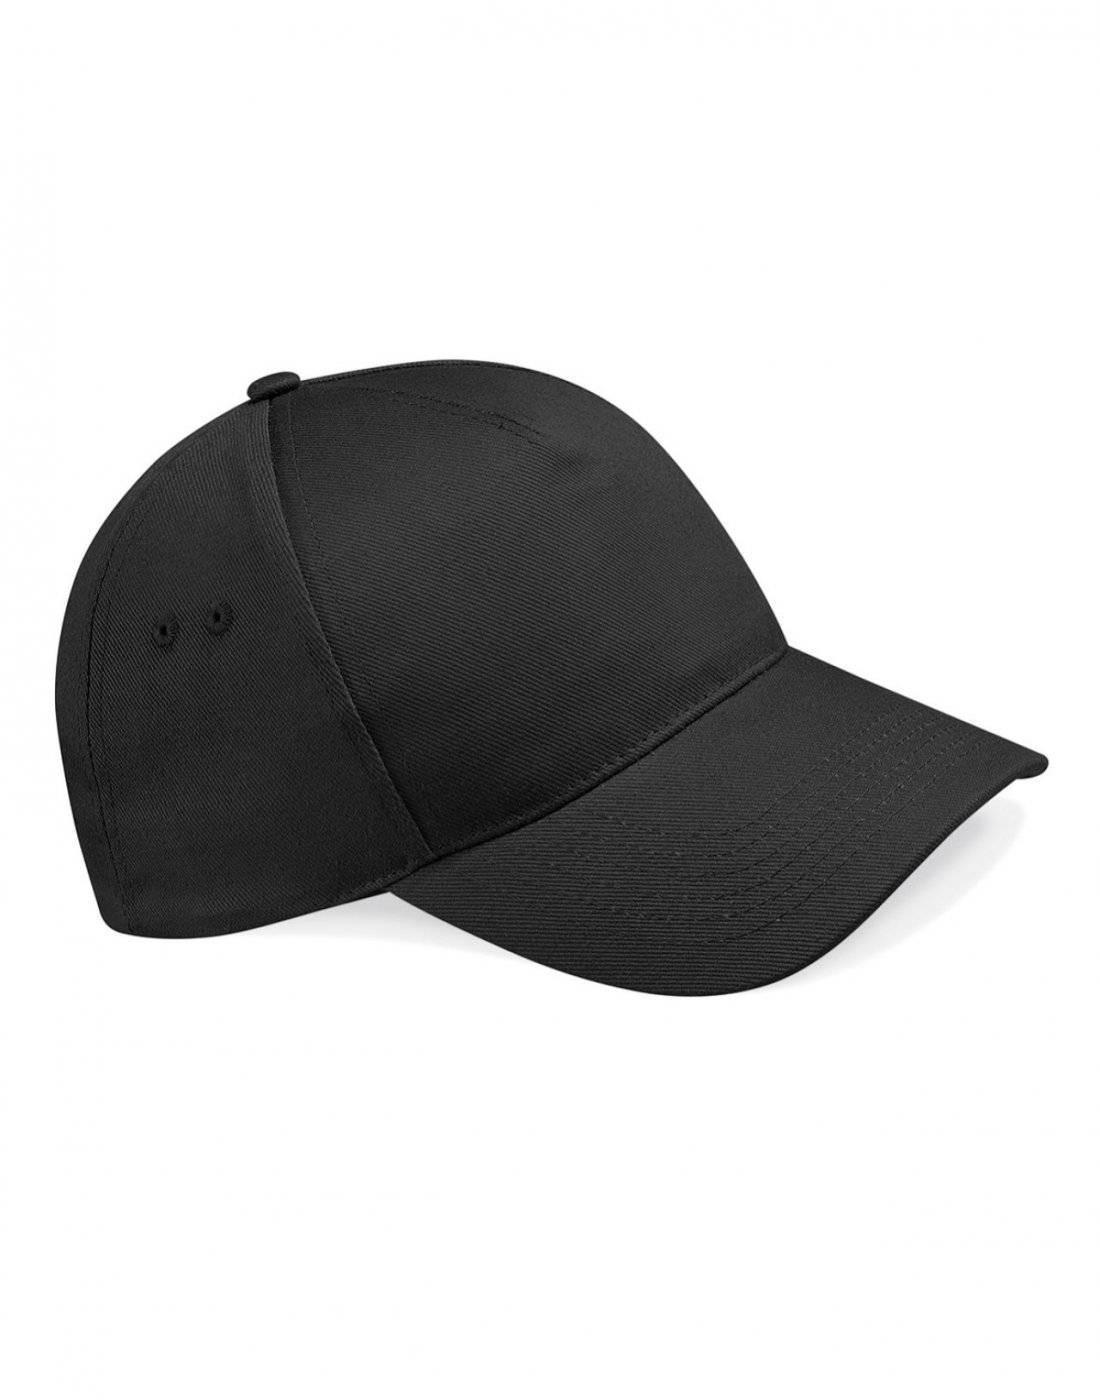 2cfe8998c1667c Personalised Ultimate 5 Panel Cap (B15) | Beechfield Headwear ...